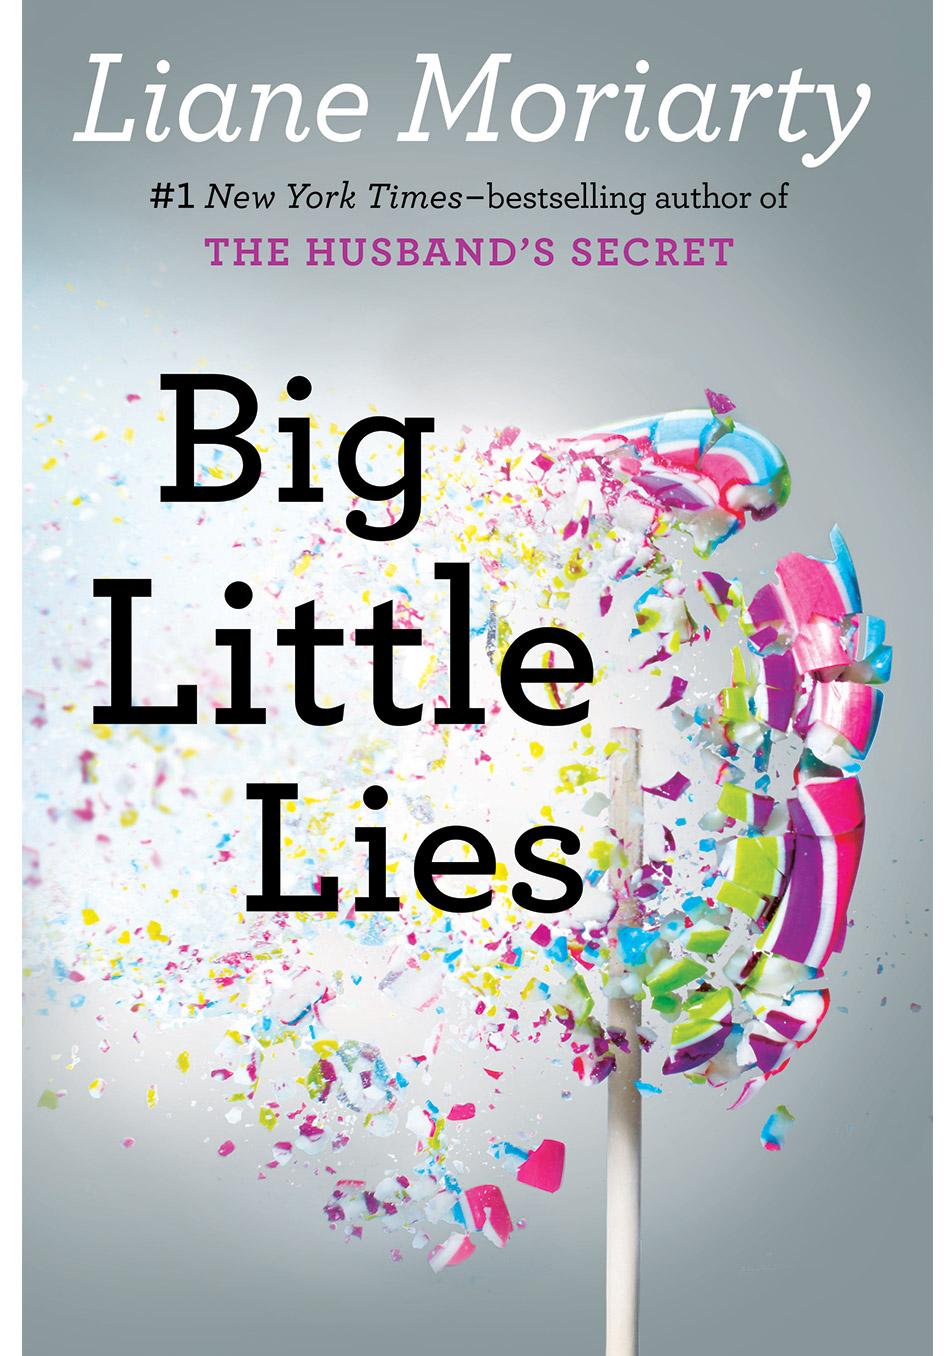 201406-beach-reads-big-little-lies-liane-moriarty-949x1356